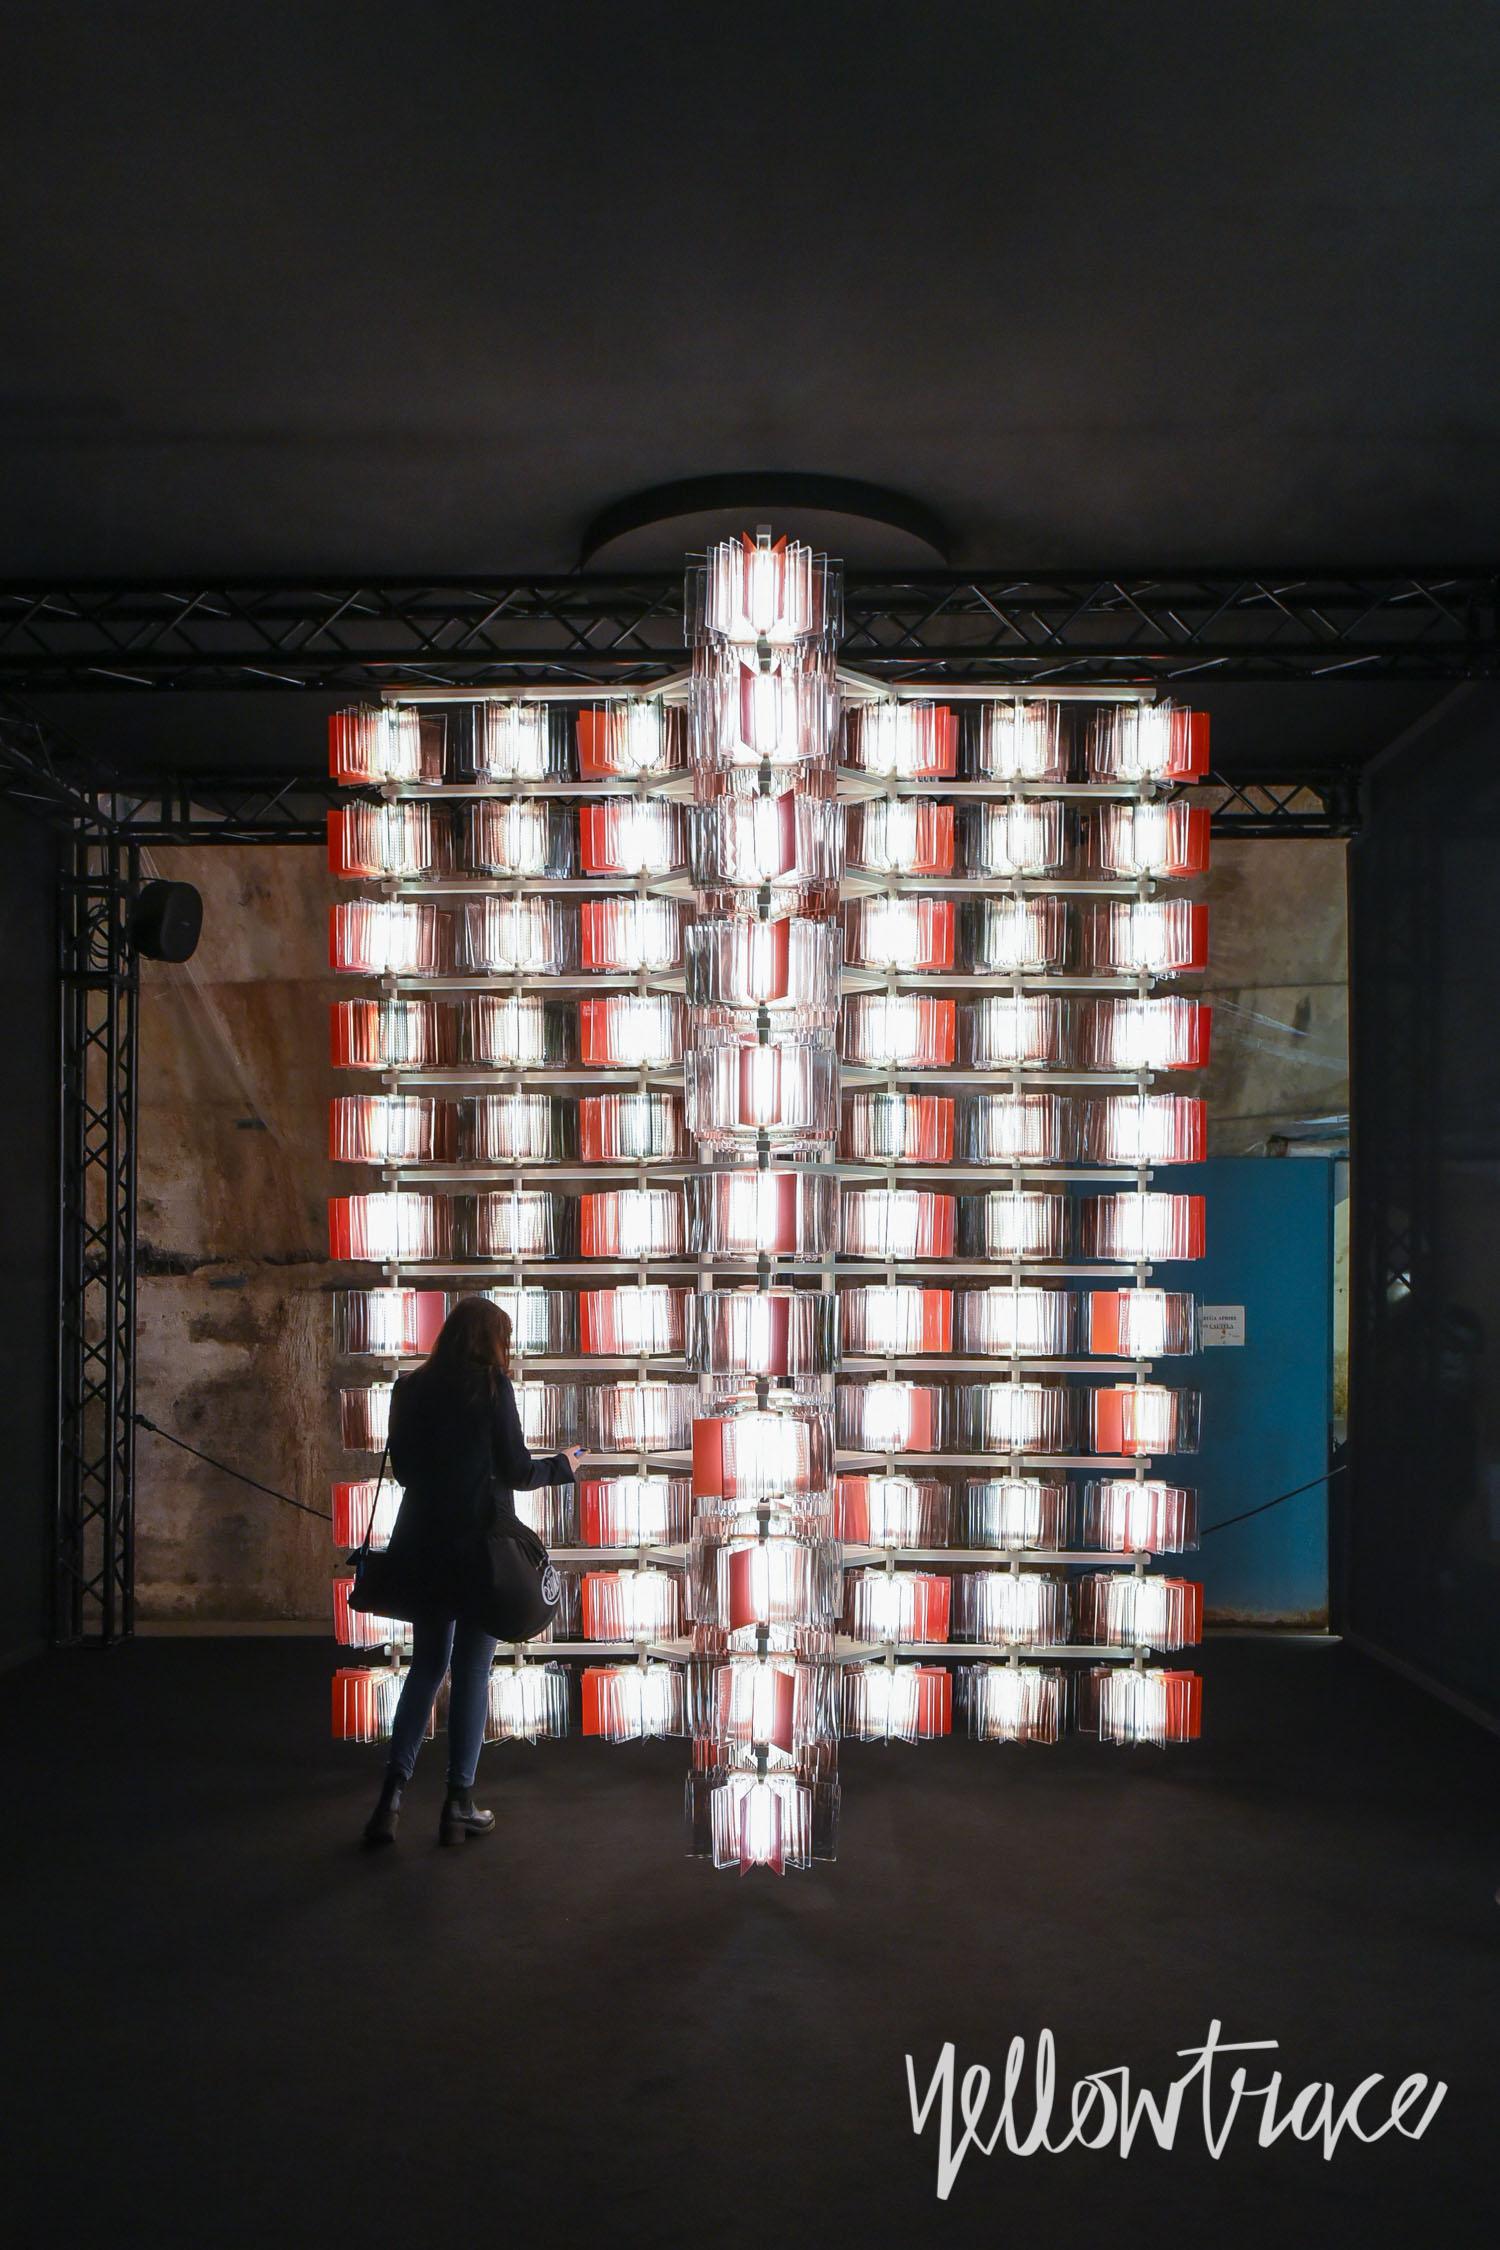 Milan Design Week 2017 Highlights, Salviati's Decode/ Recode at Ventura Centrale, Photo © Nick Hughes | #Milantrace2017